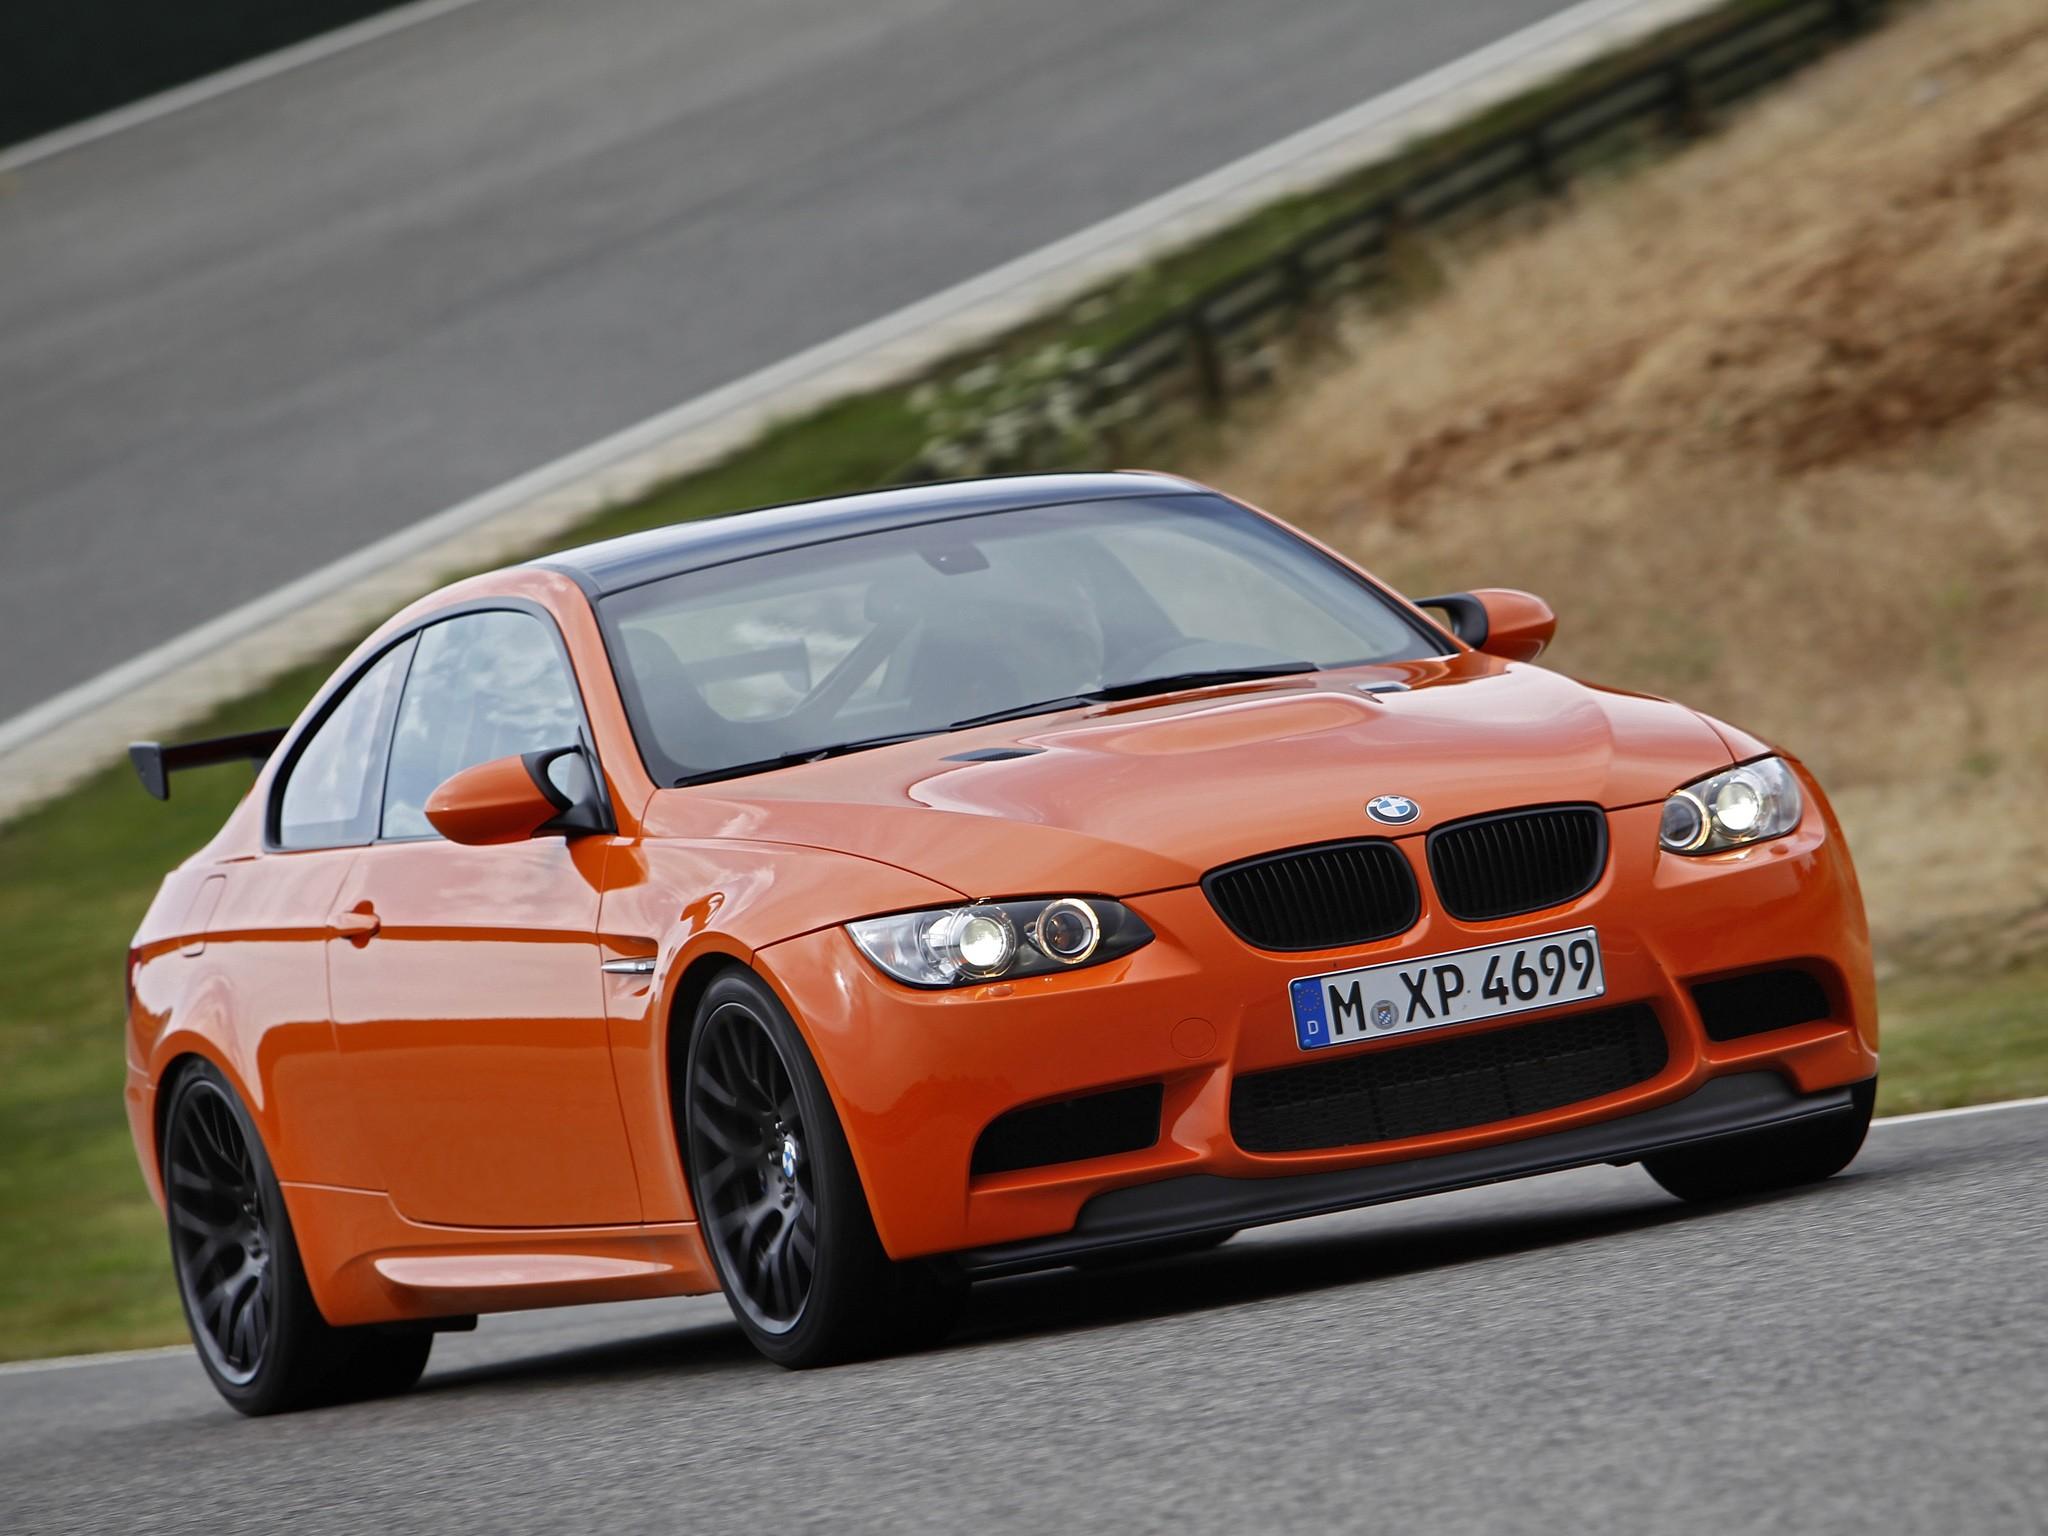 BMW M GTS E Specs Autoevolution - 2010 bmw m3 price